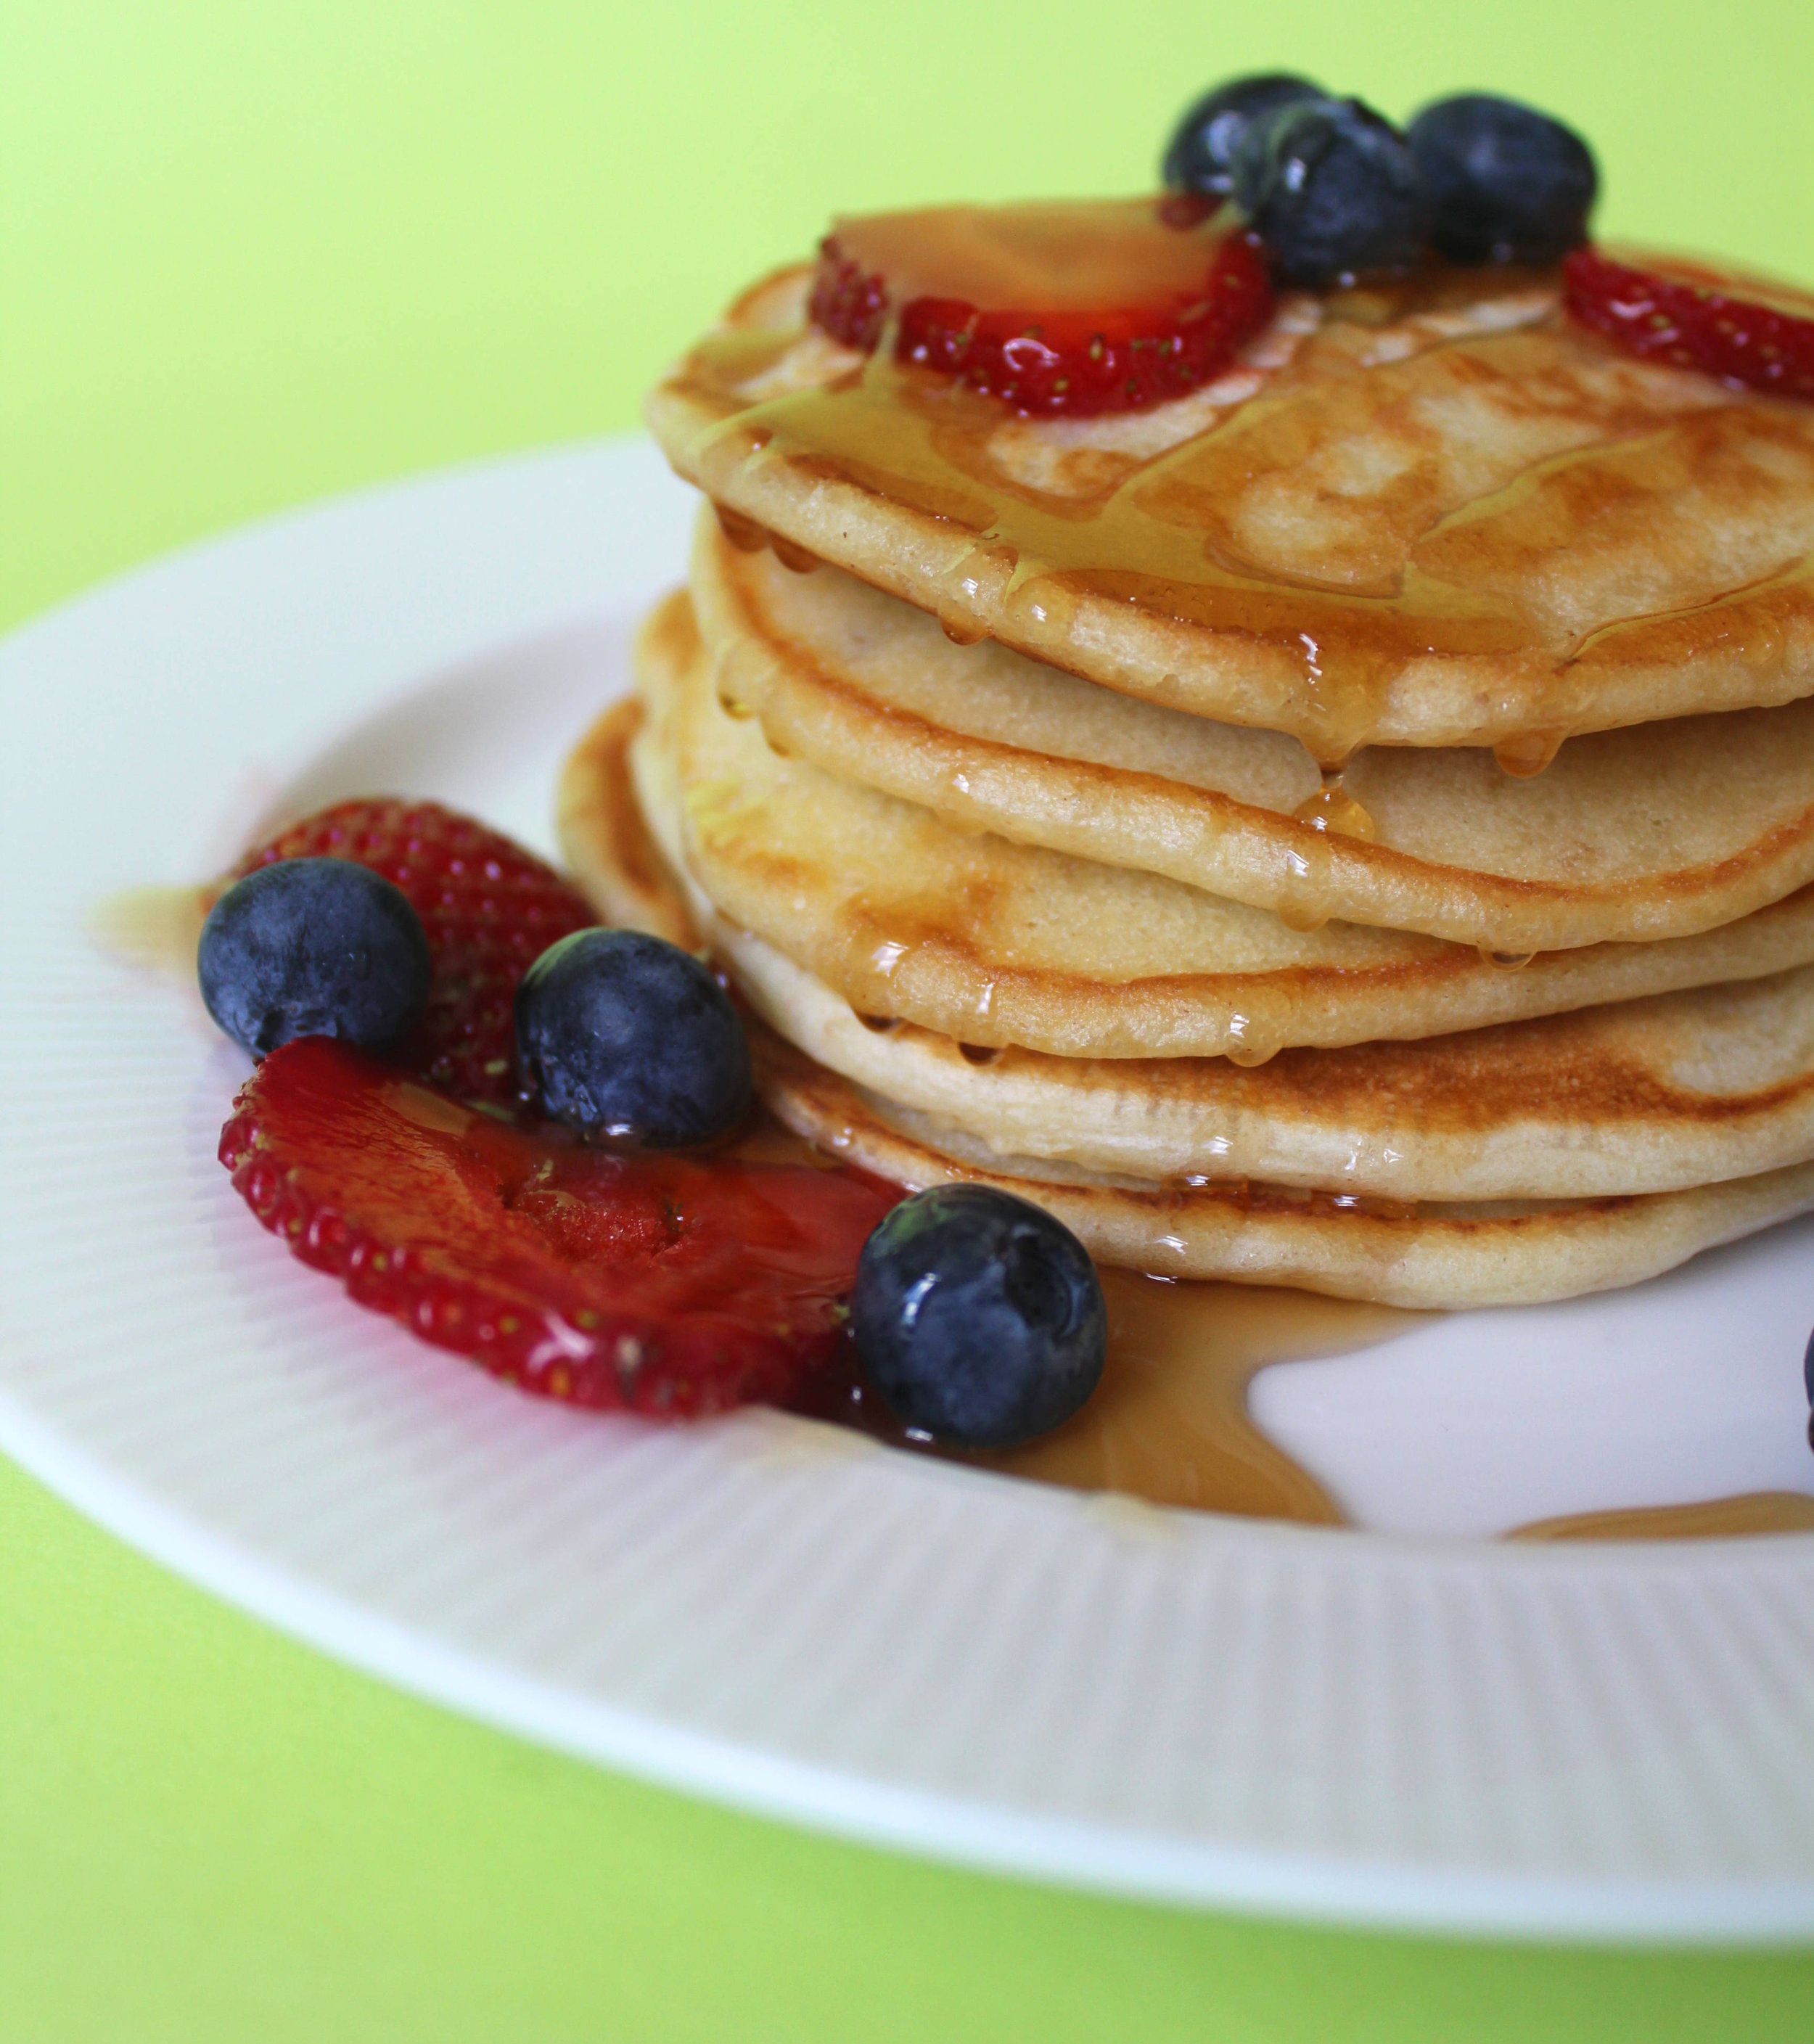 vegan_american_pancakes.JPG